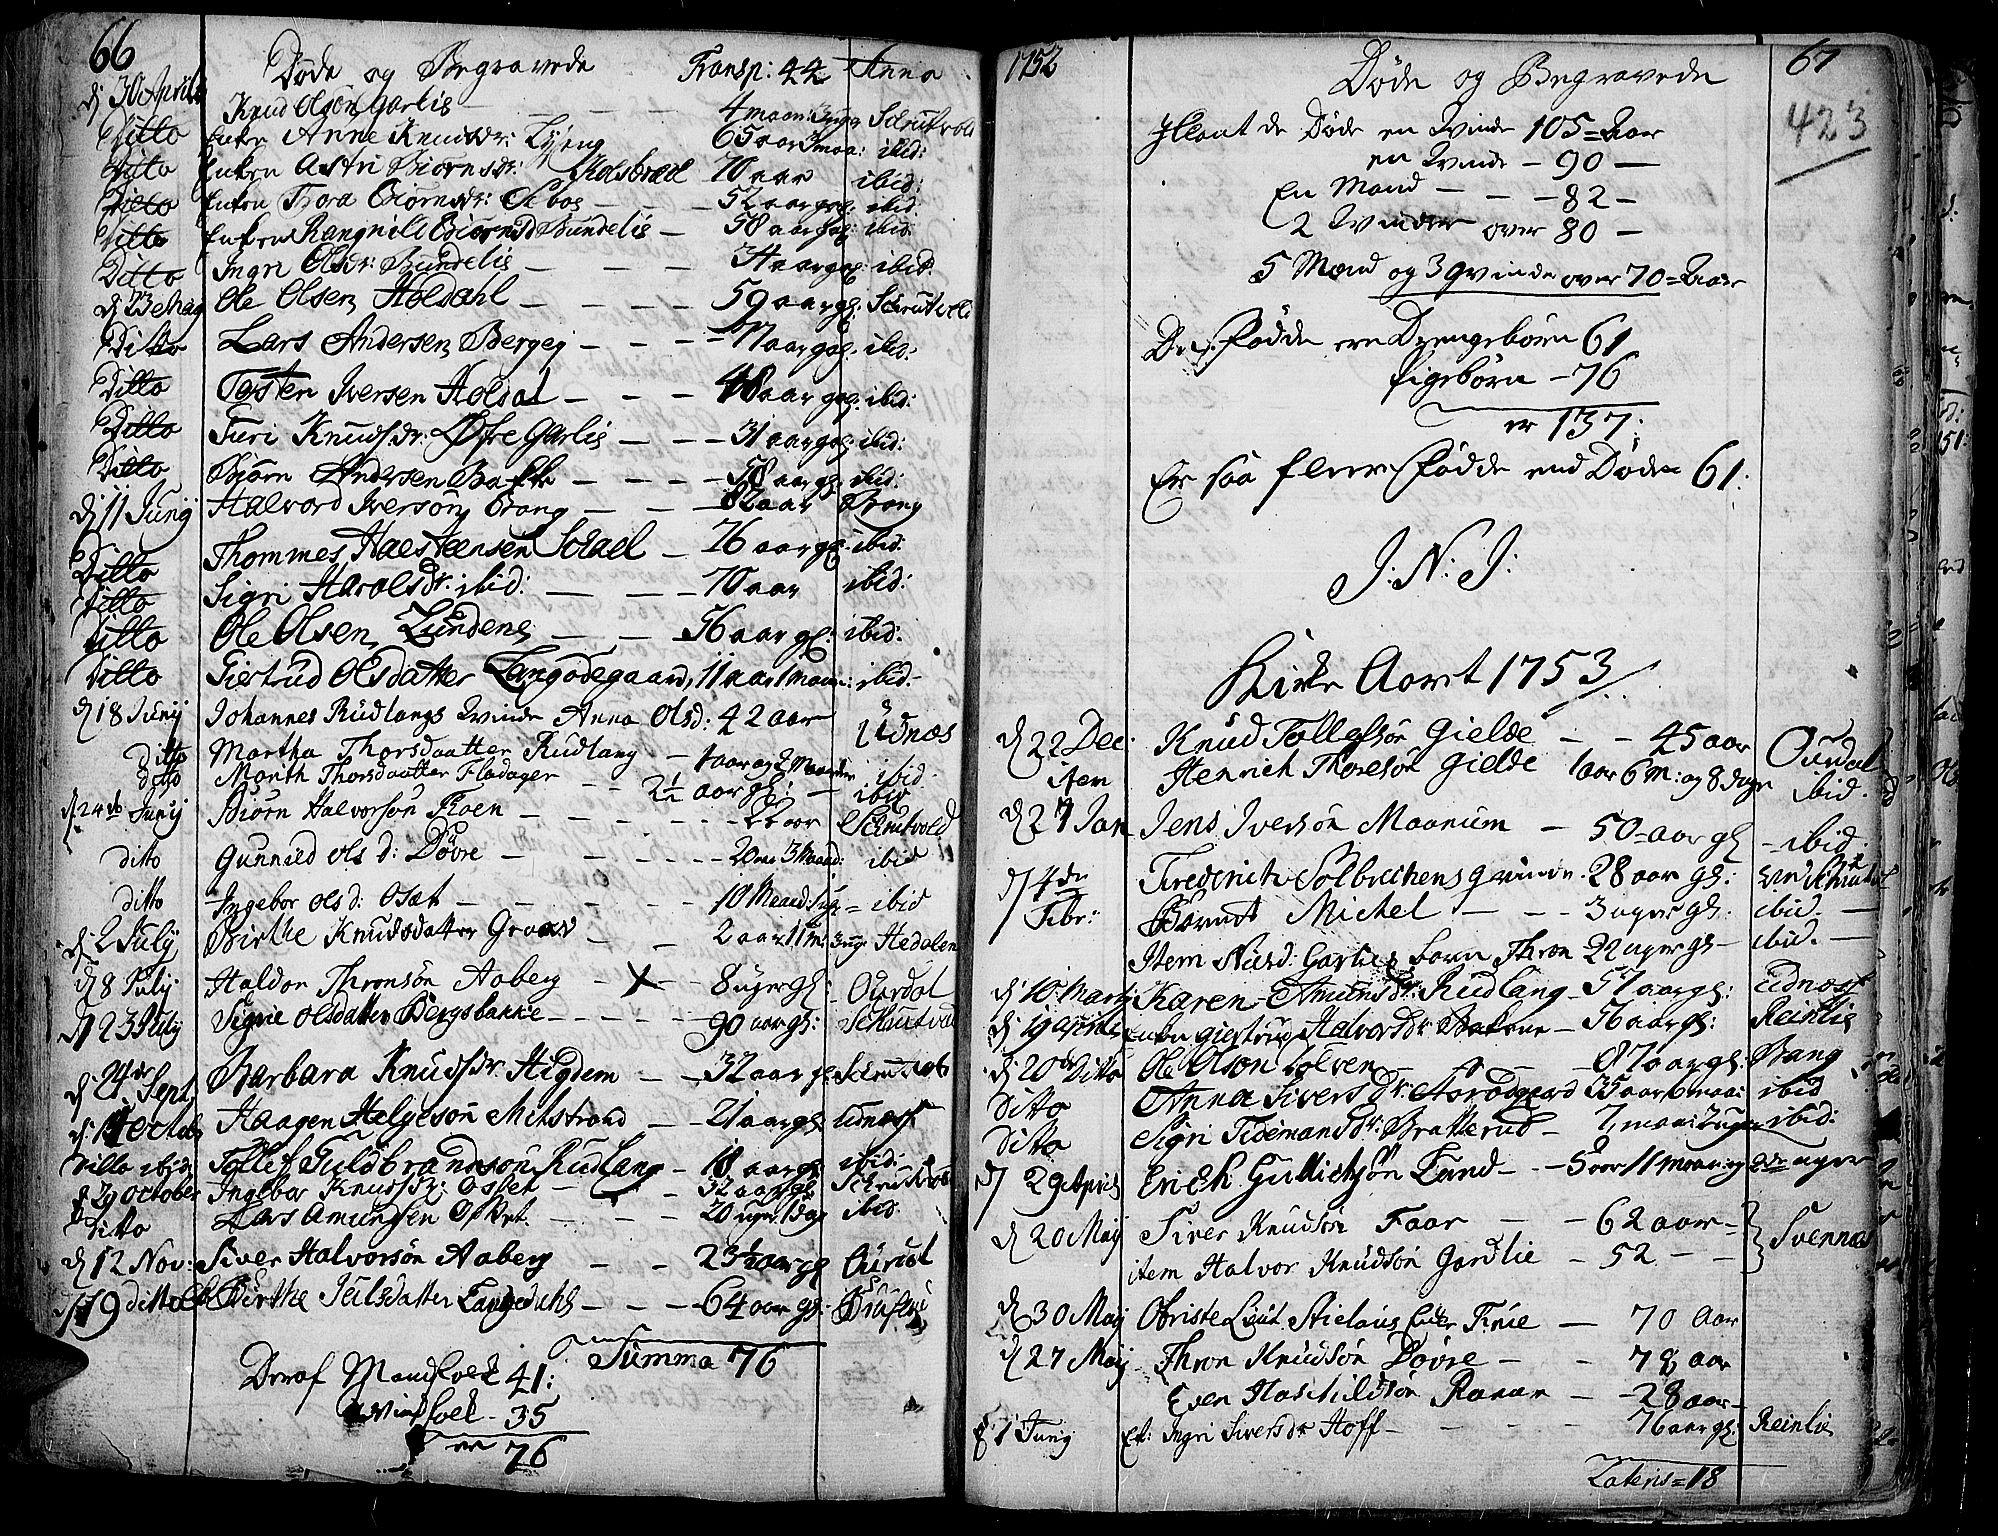 SAH, Aurdal prestekontor, Ministerialbok nr. 4, 1730-1762, s. 66-67